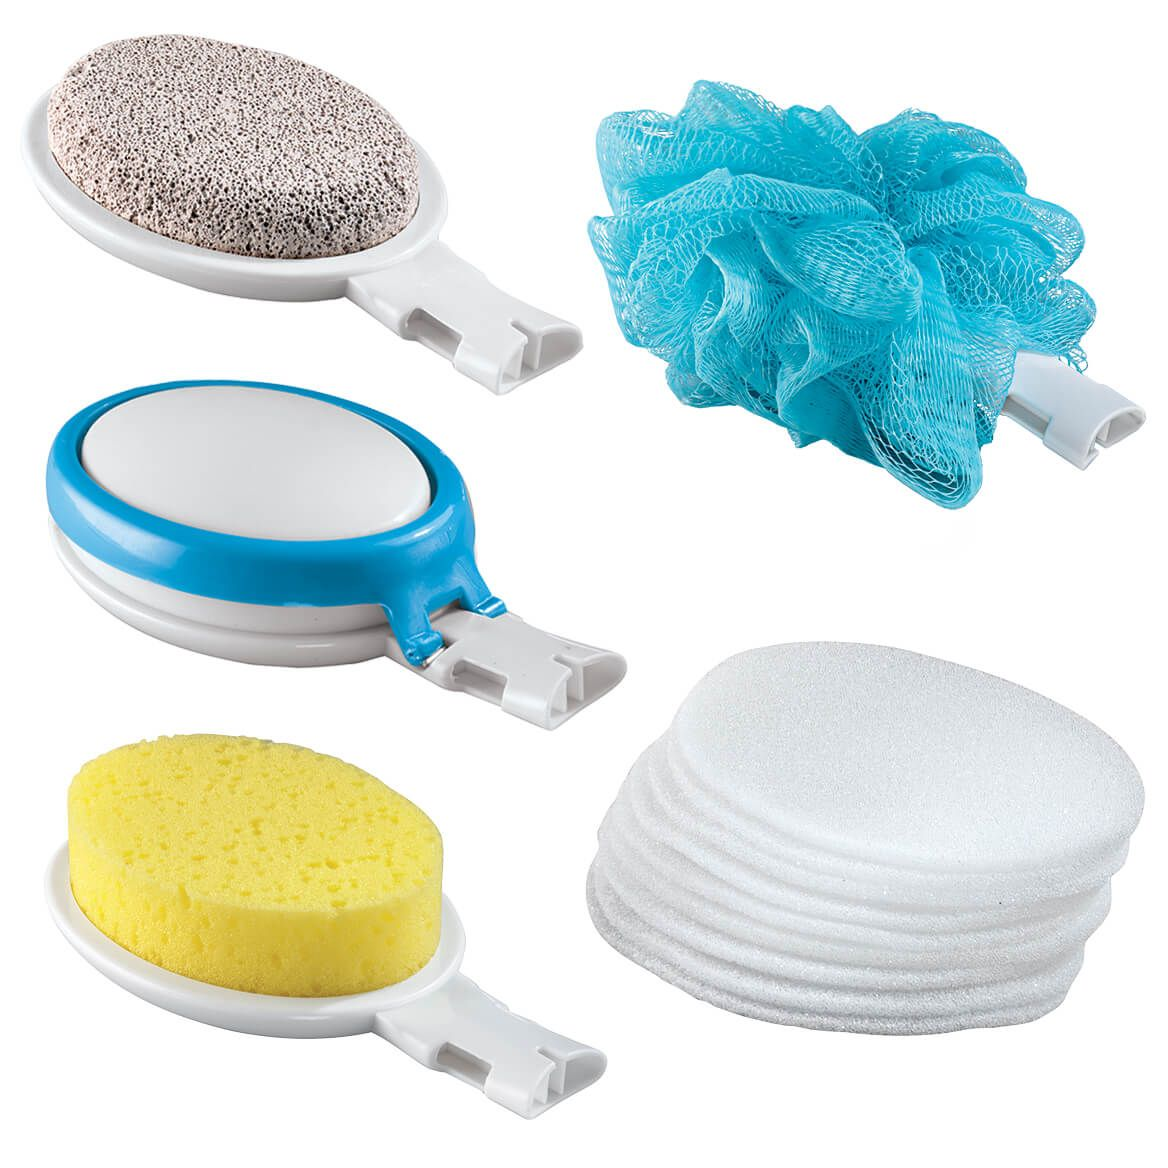 15 Piece Interchangeable Bath Sponges With Handle-342514